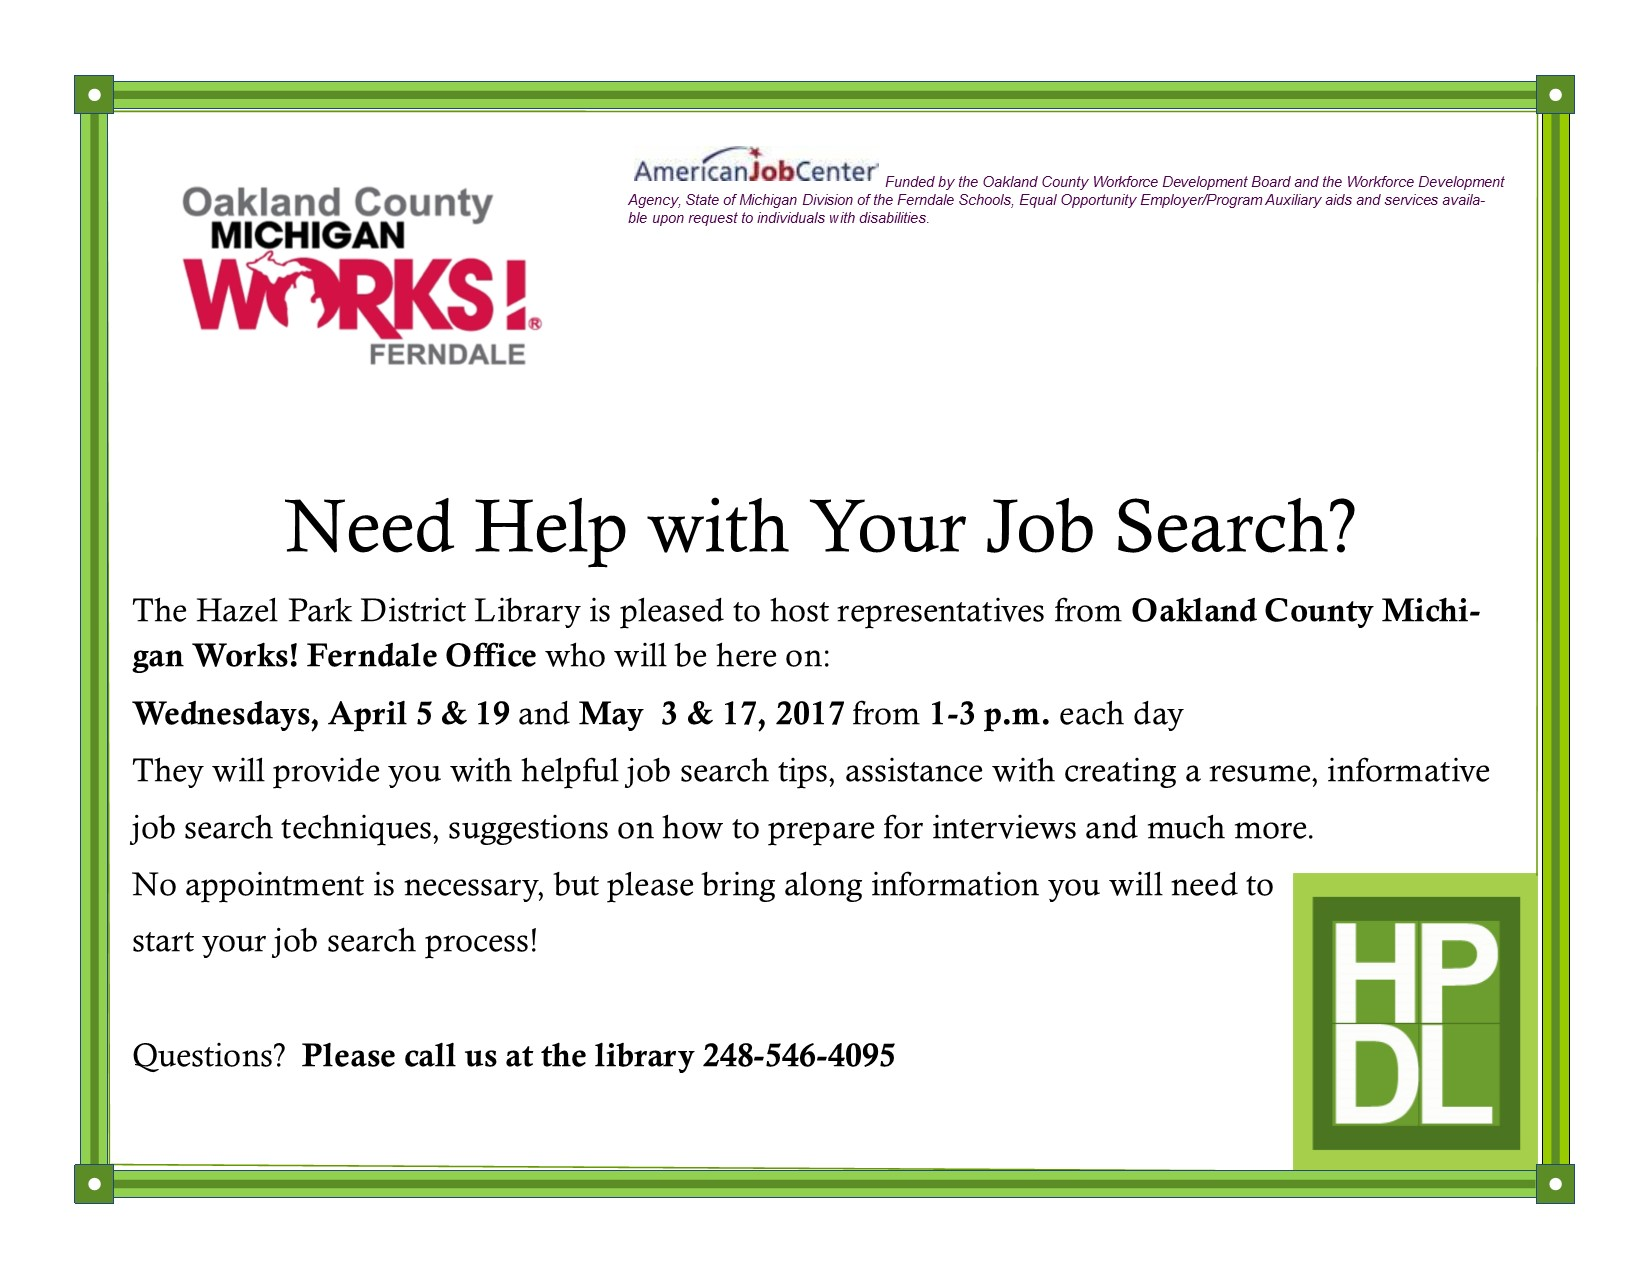 hazel park district library michigan works